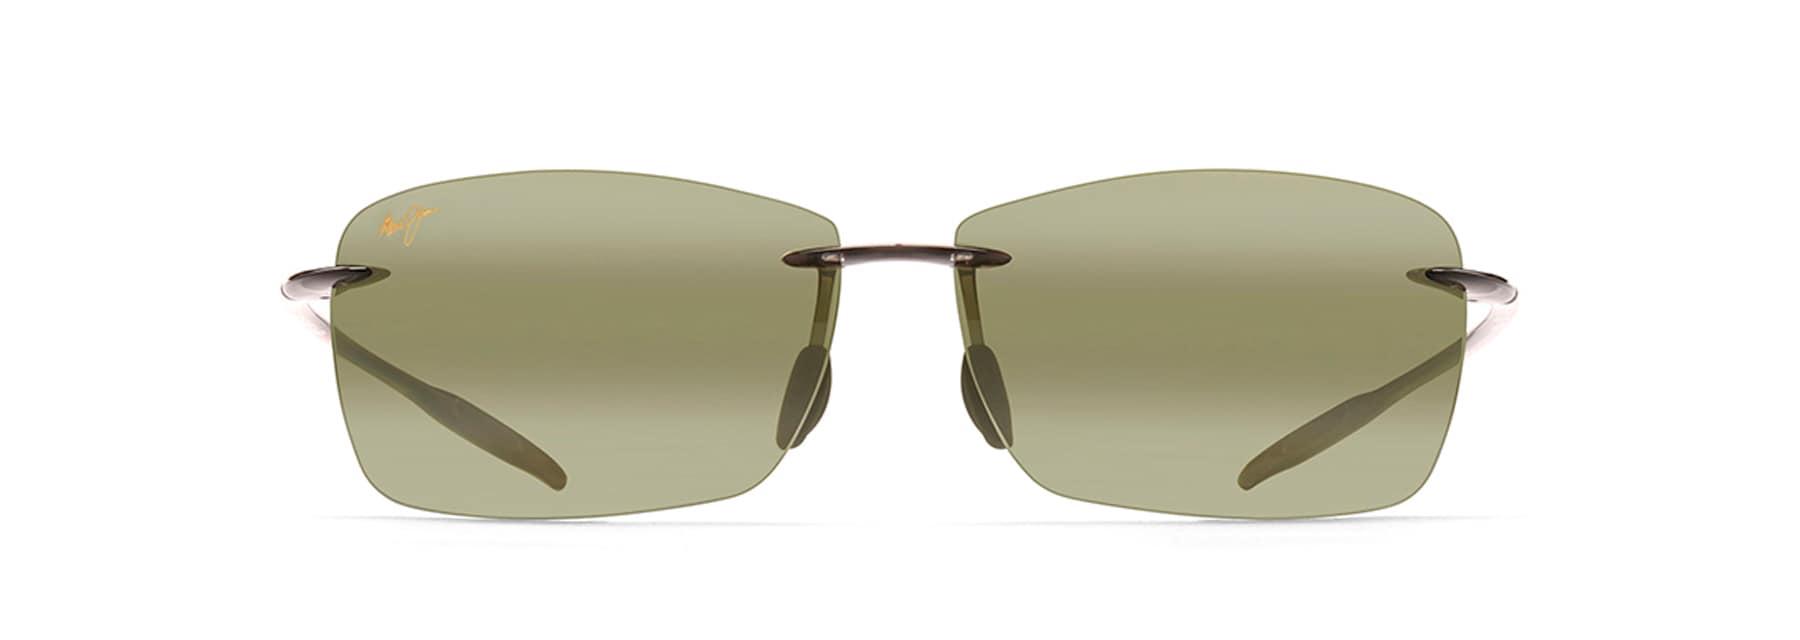 e8e083d2de2c Lighthouse Polarized Sunglasses